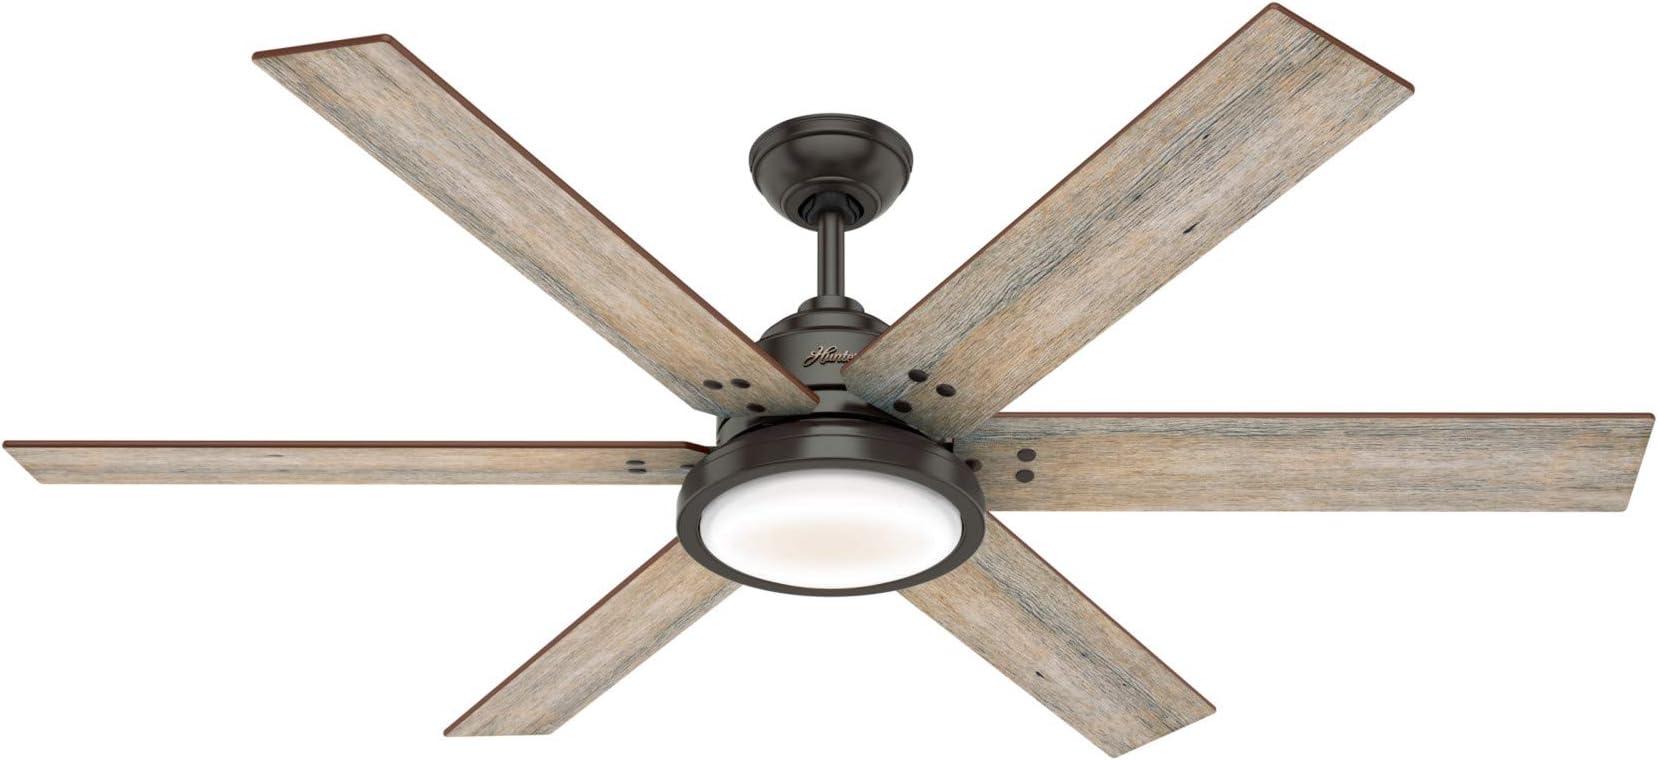 "Hunter Warrant Indoor Ceiling Fan with LED Light, 60"", Nobel Bronze"